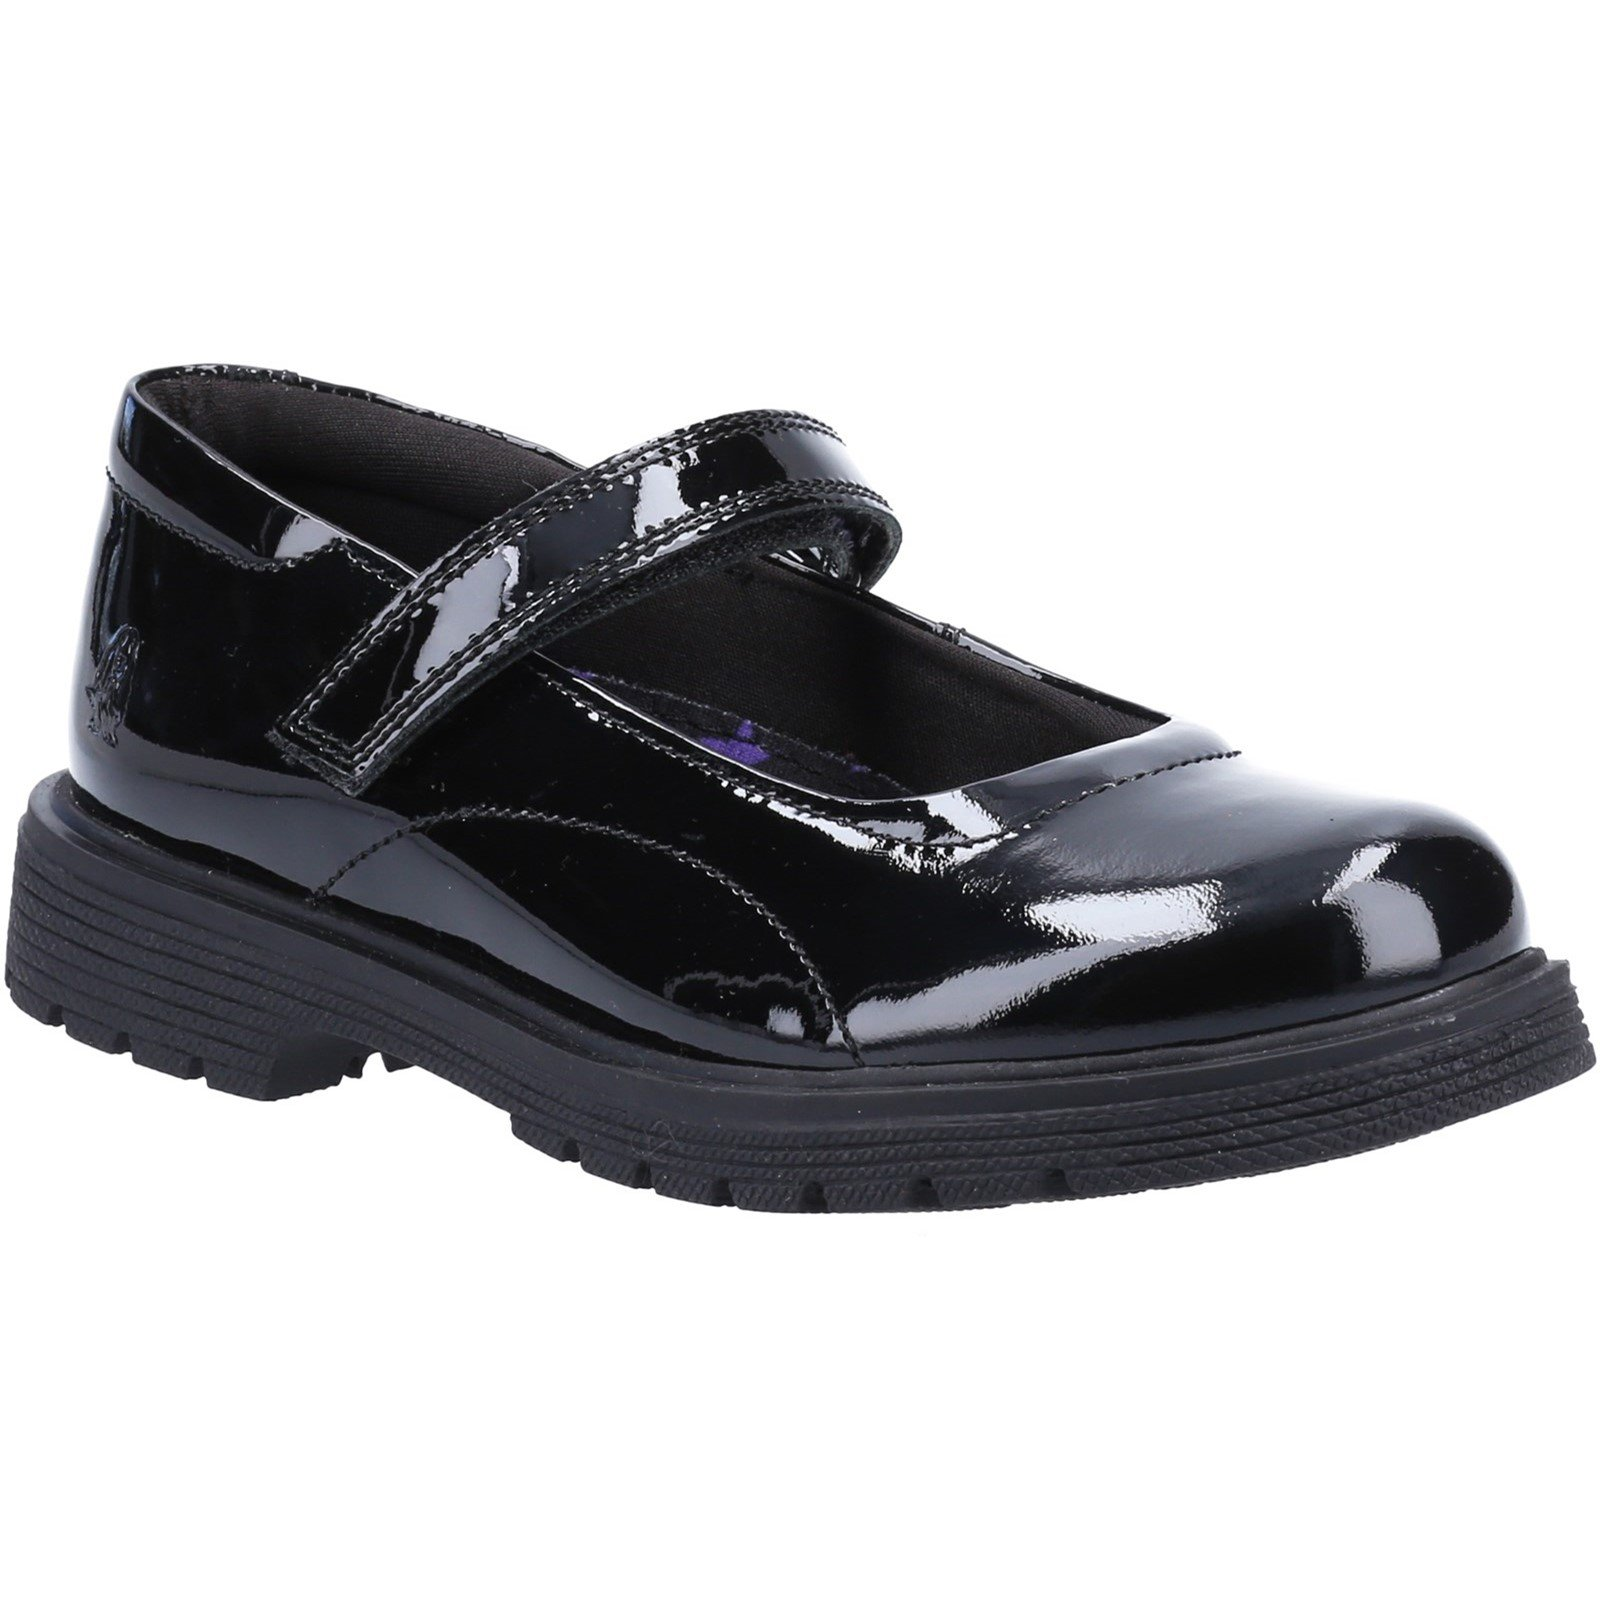 Hush Puppies Kid's Tally Junior School Shoe Patent Black 32814 - Patent Black 1